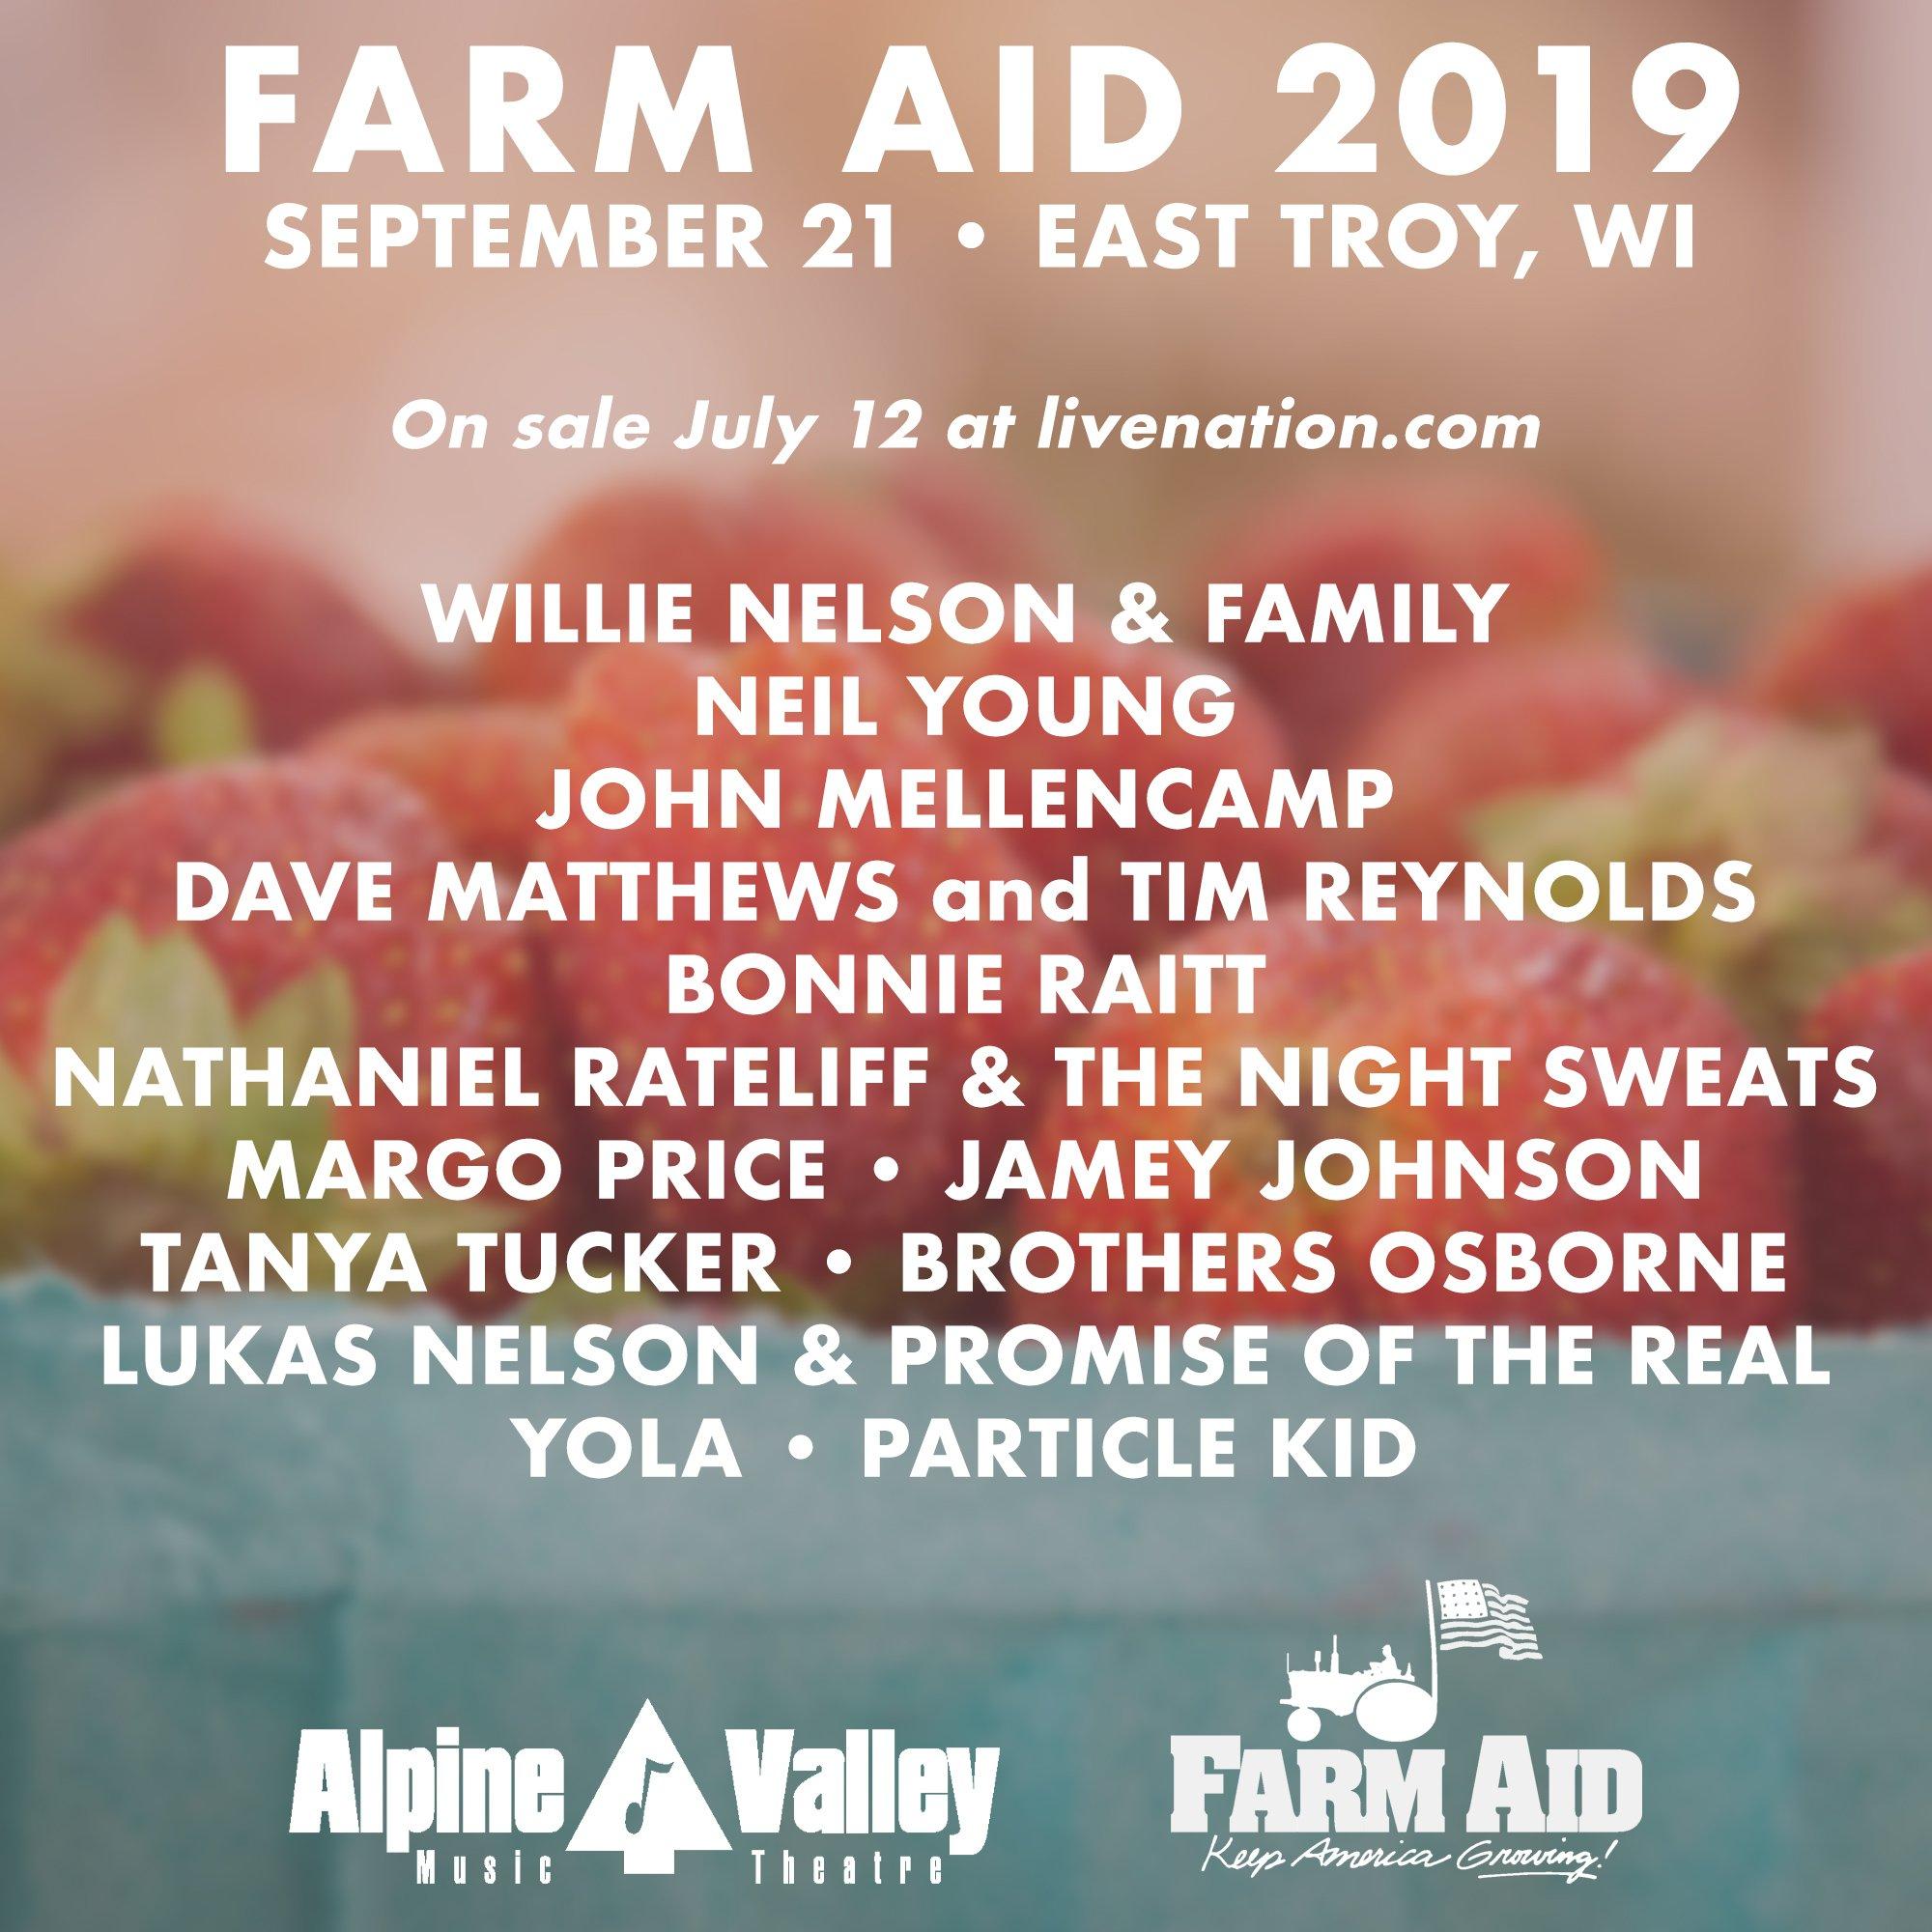 Farm Aid 2019 to Air Live on AXS TV, SiriusXM | Best Classic